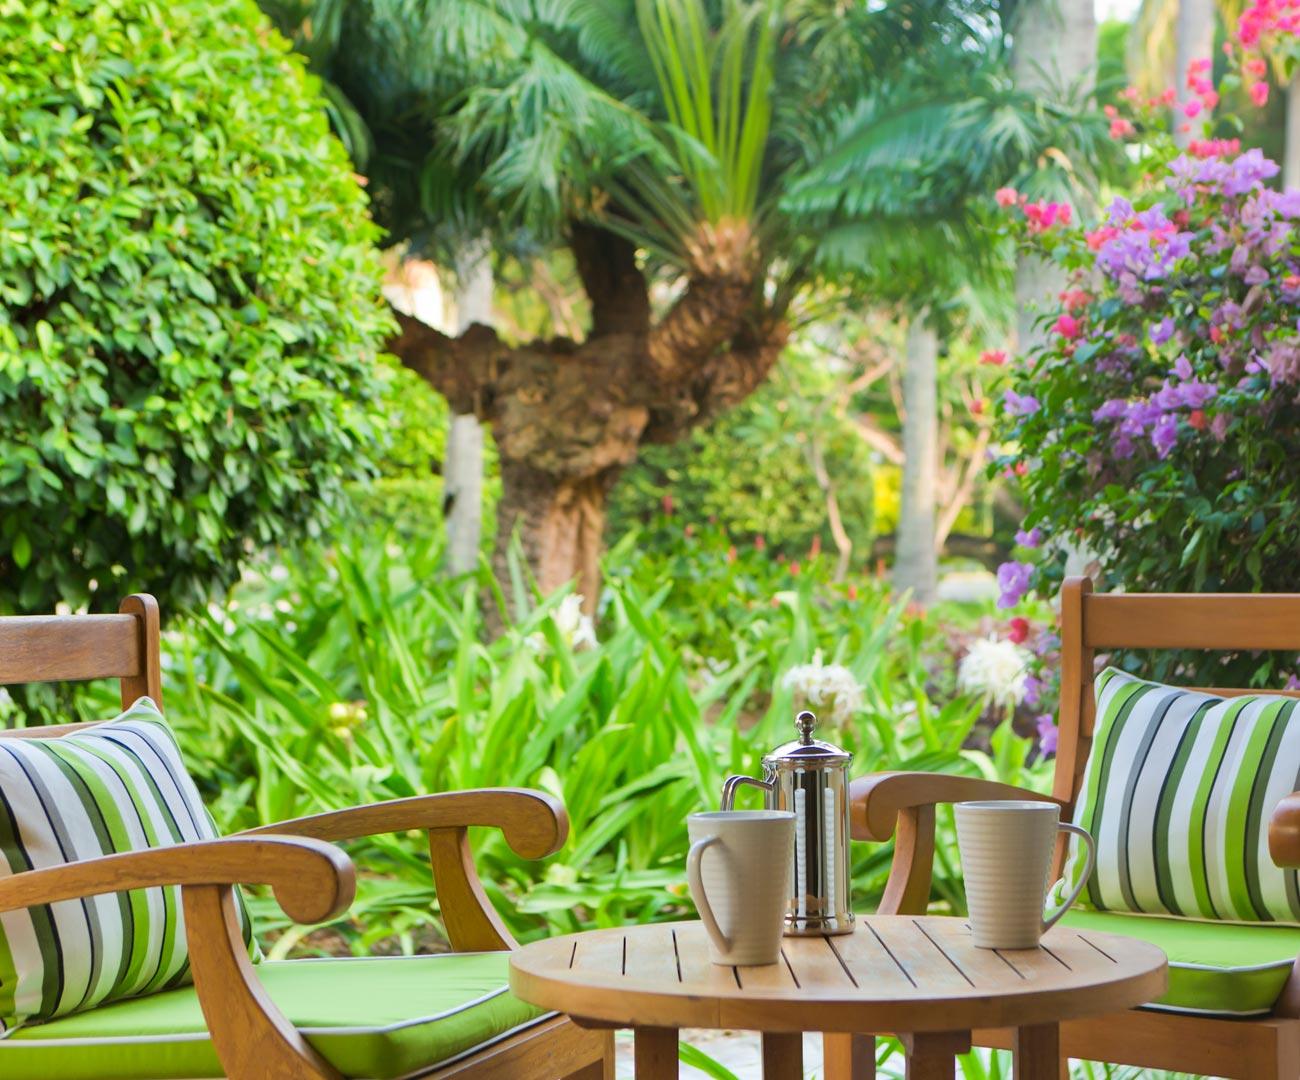 Kurumba Maldives - Garden Pool Villa - Balcony and View Image - Maldives Resort